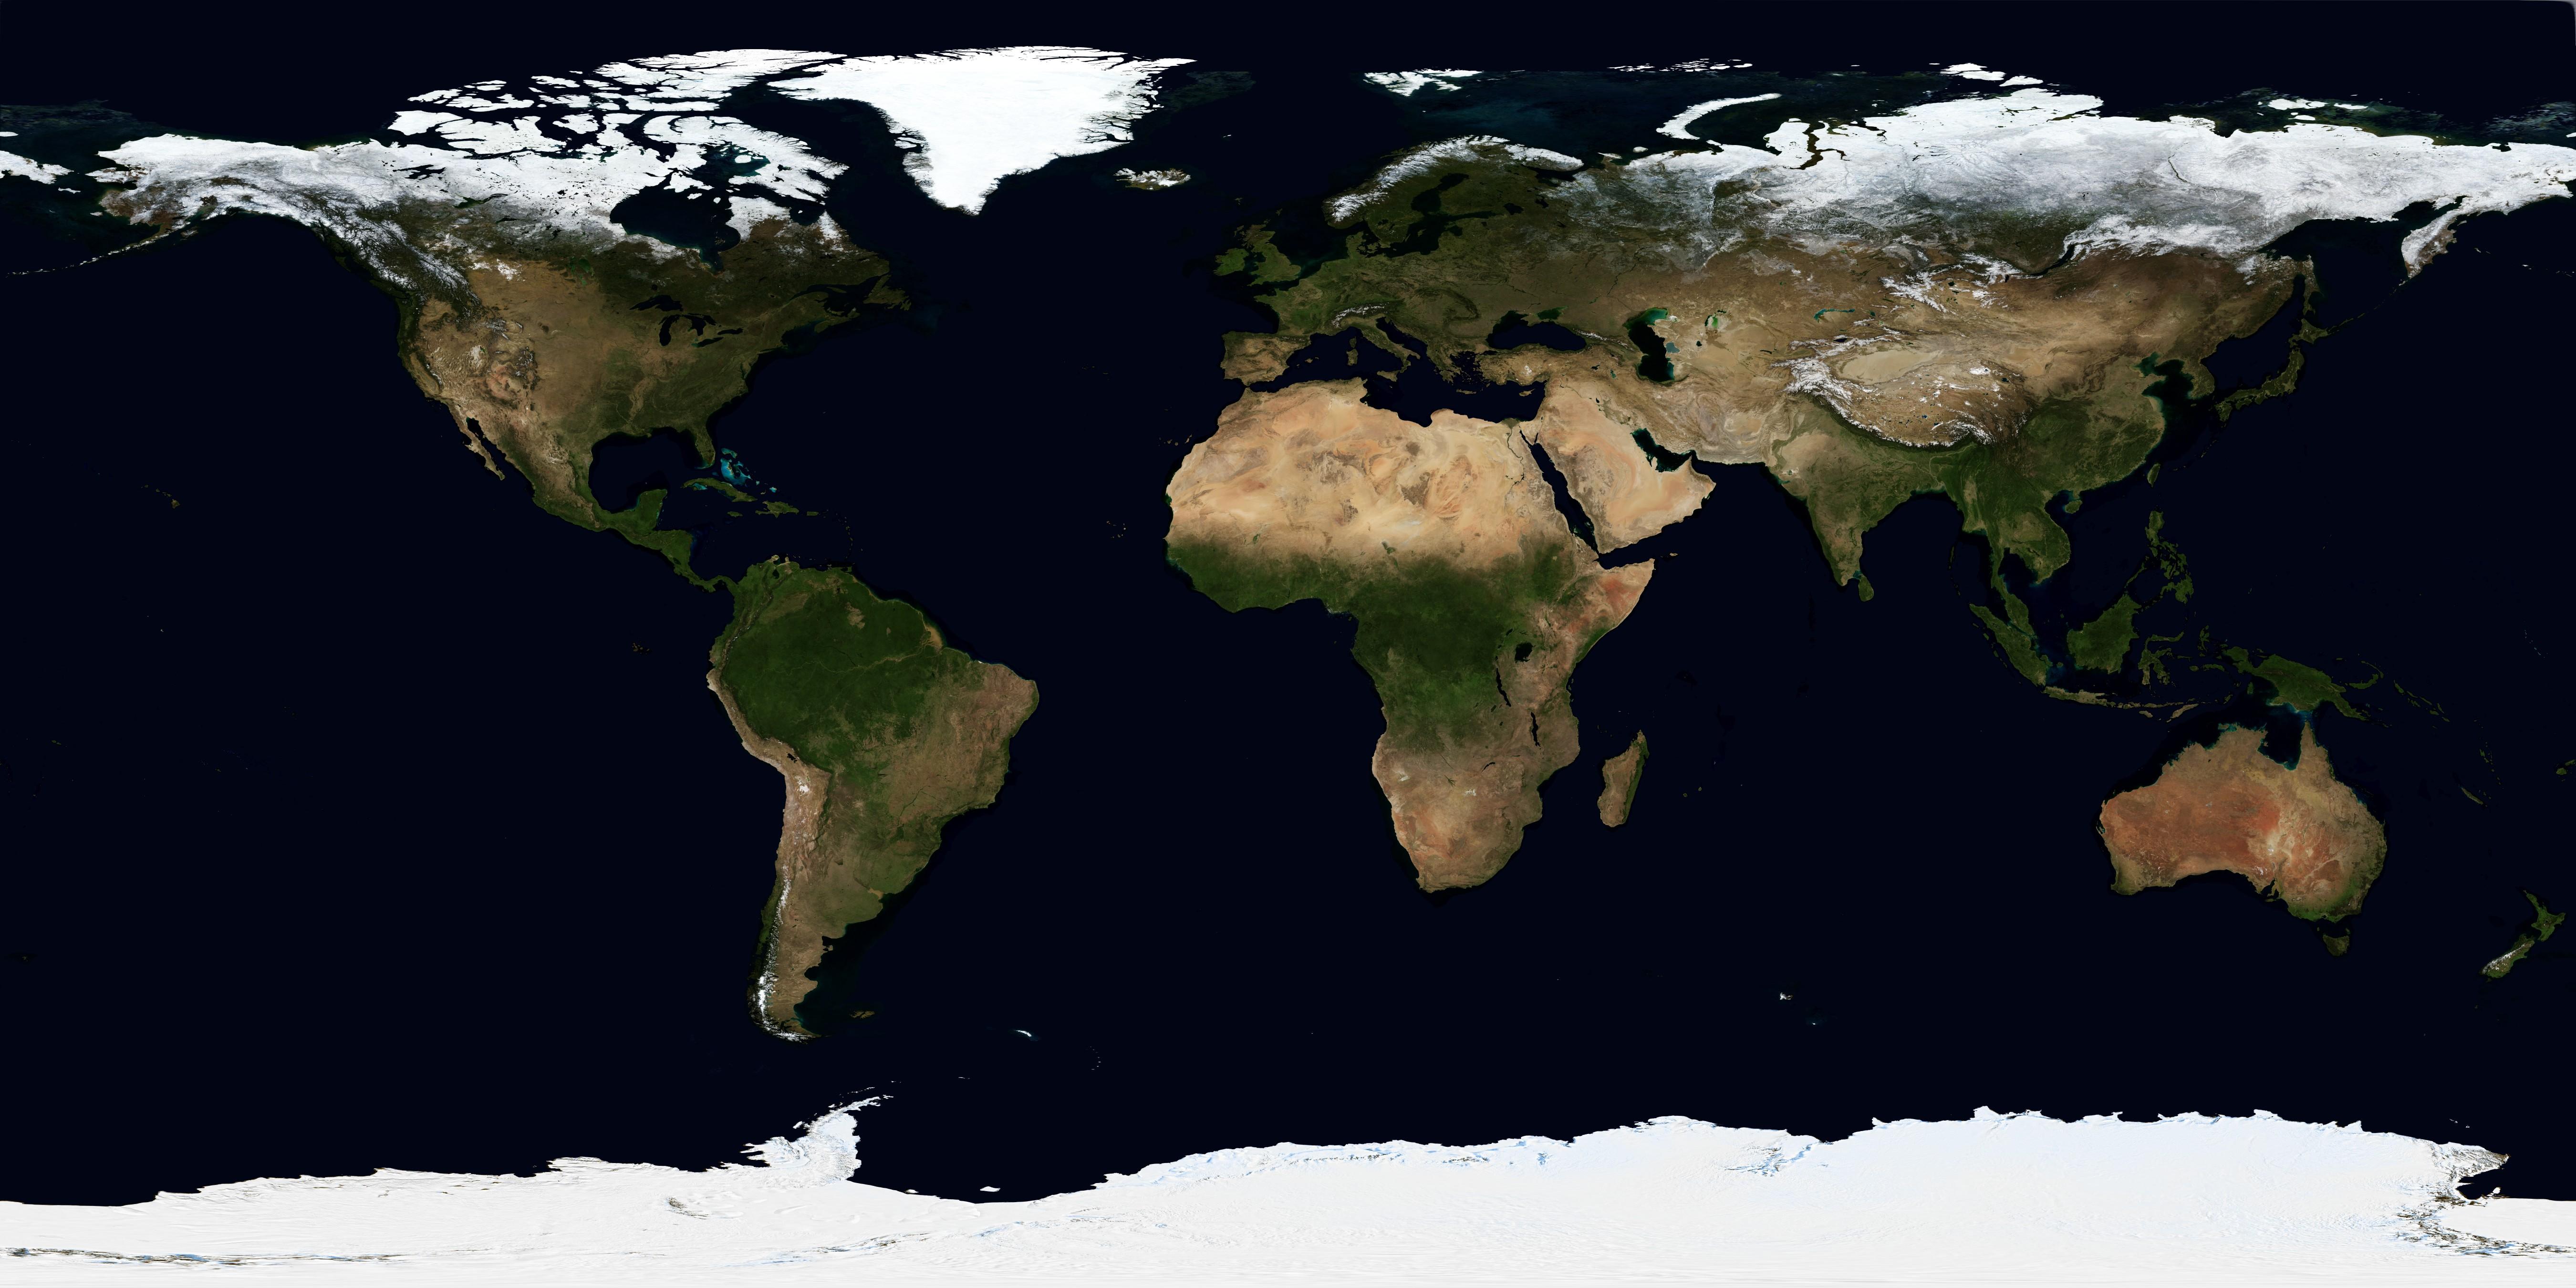 NASA Visible Earth: October, Blue Marble Next Generation w